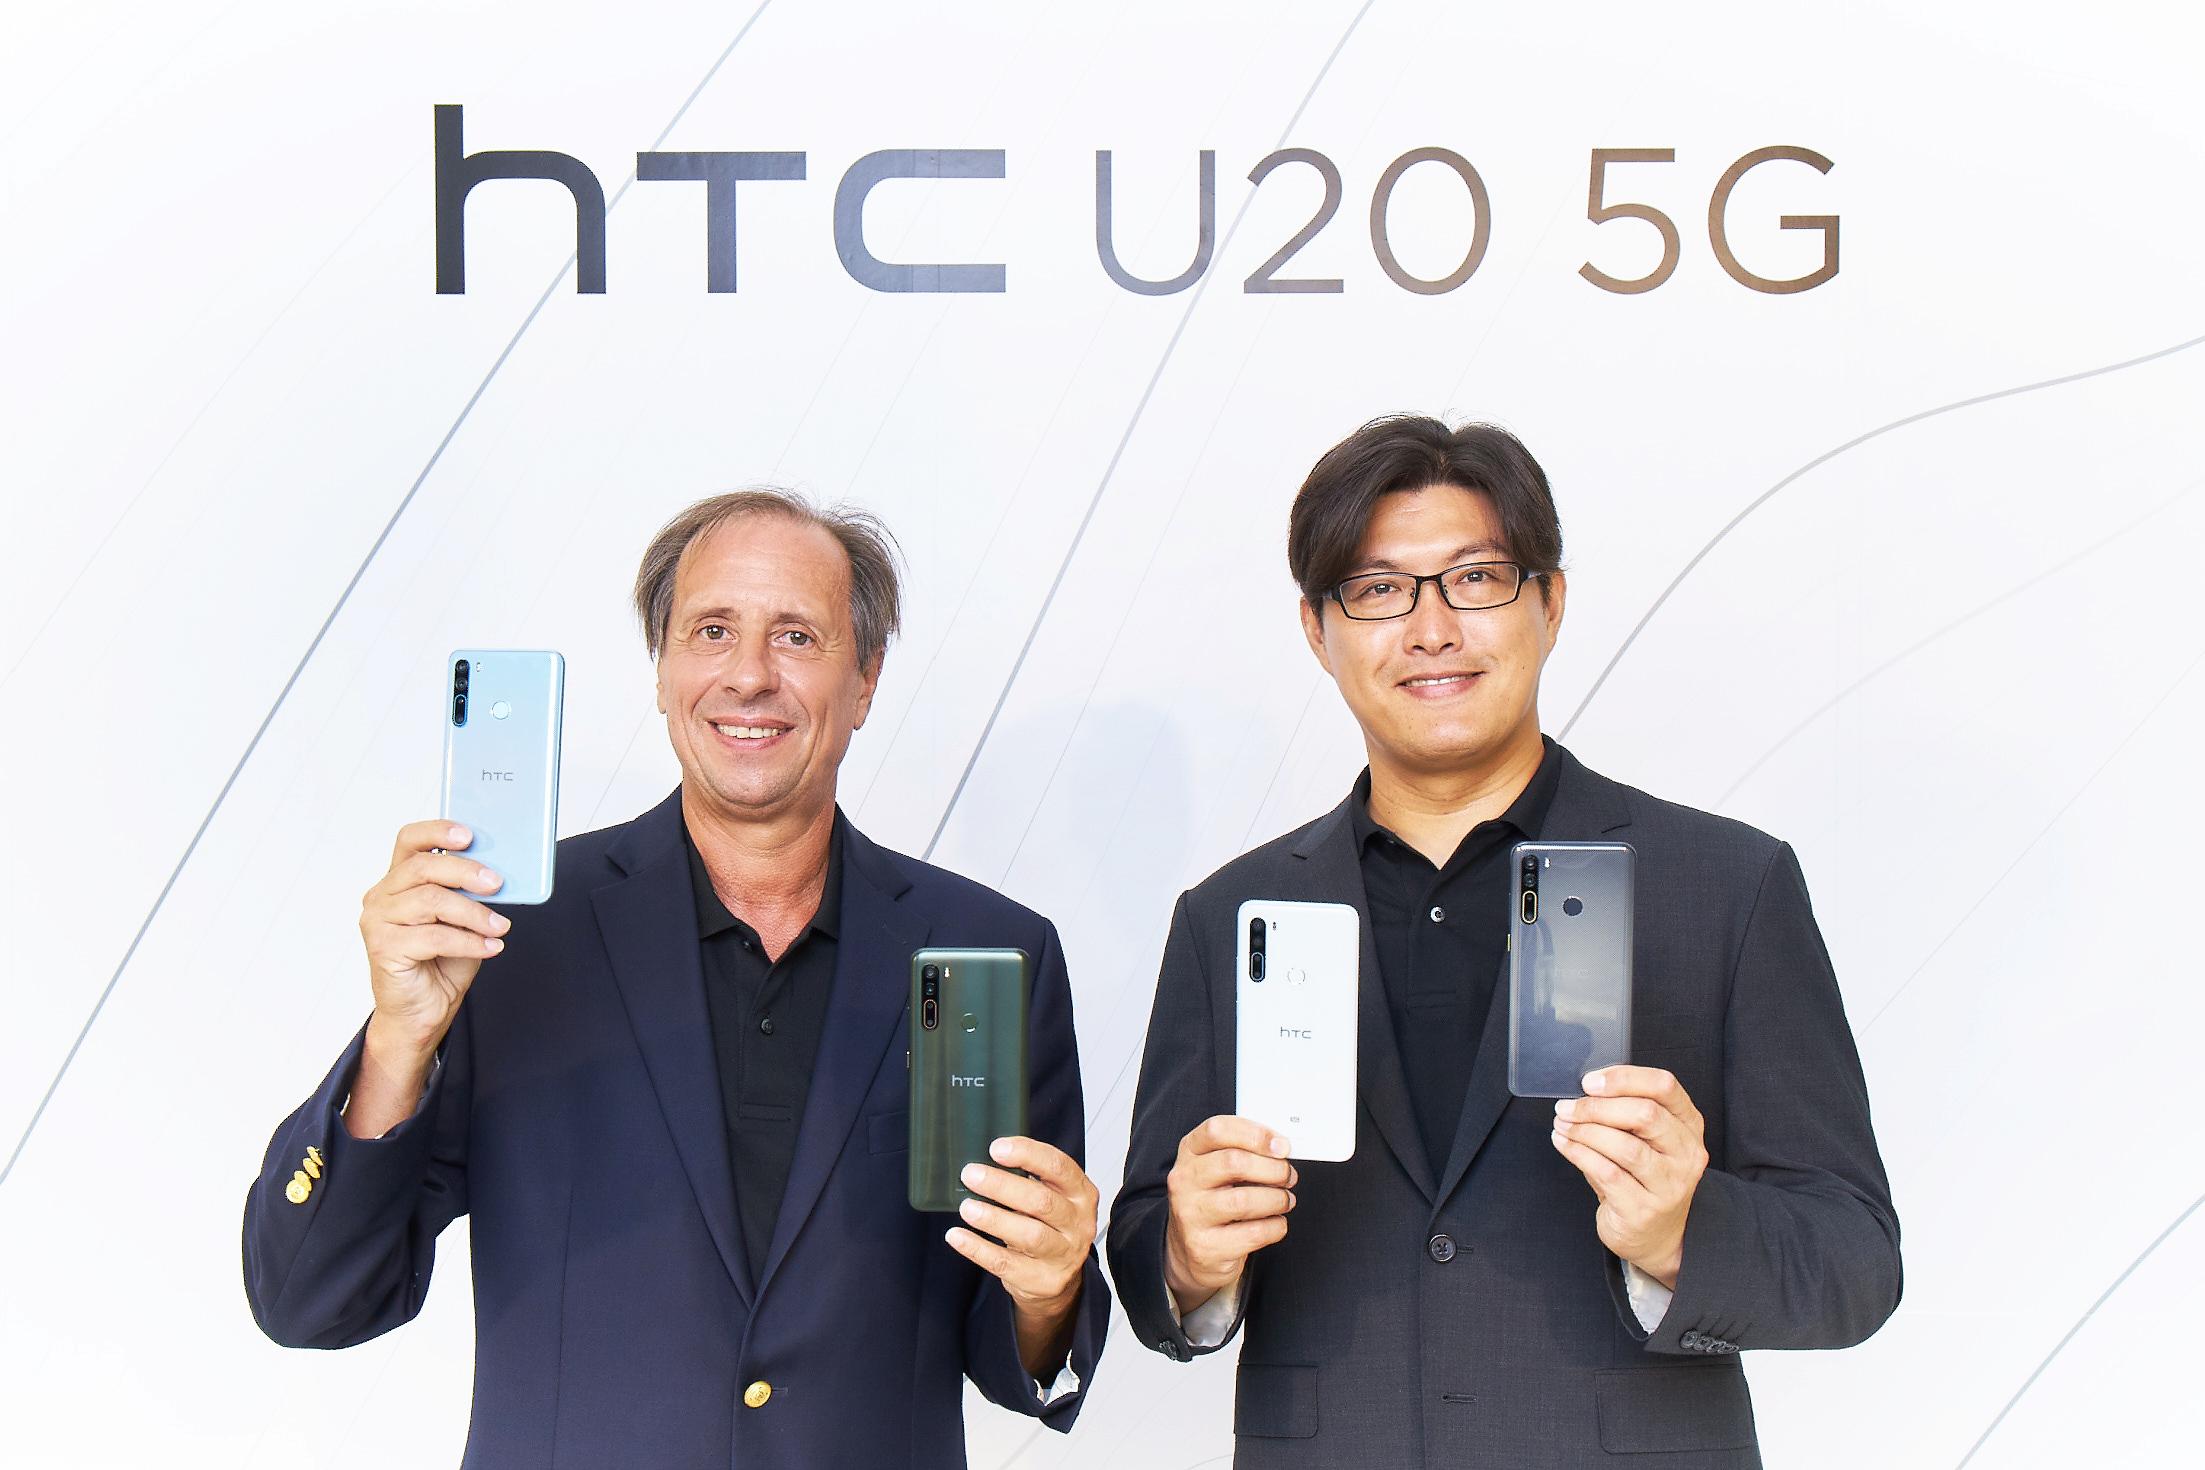 HTC台灣區總經理陳柏諭、HTC CEO Yves Maitre